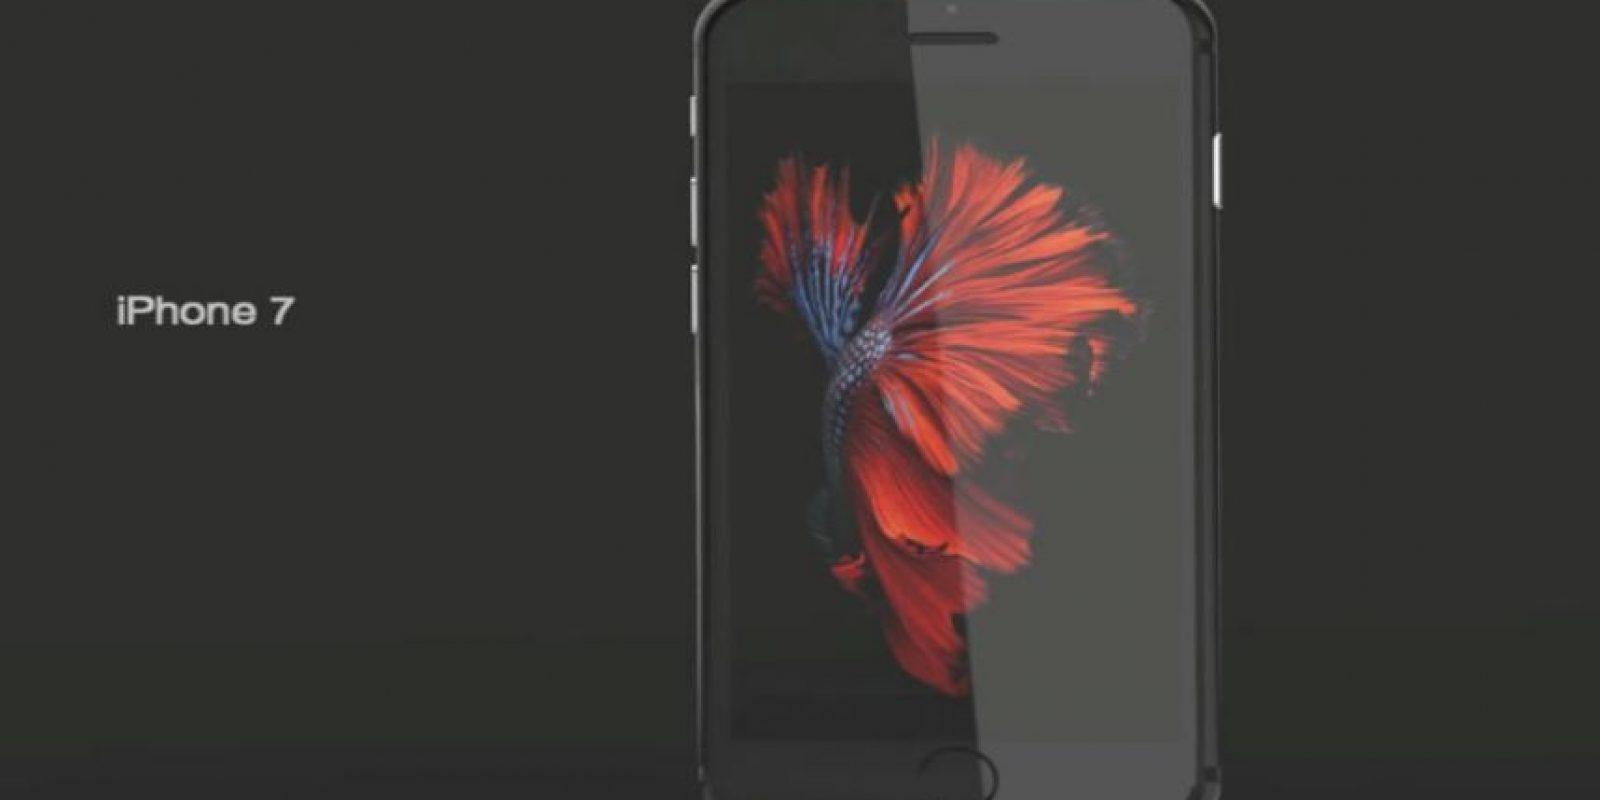 Sería del mismo tamaño que el iPhone 6s. Foto:Geert van Uffelen